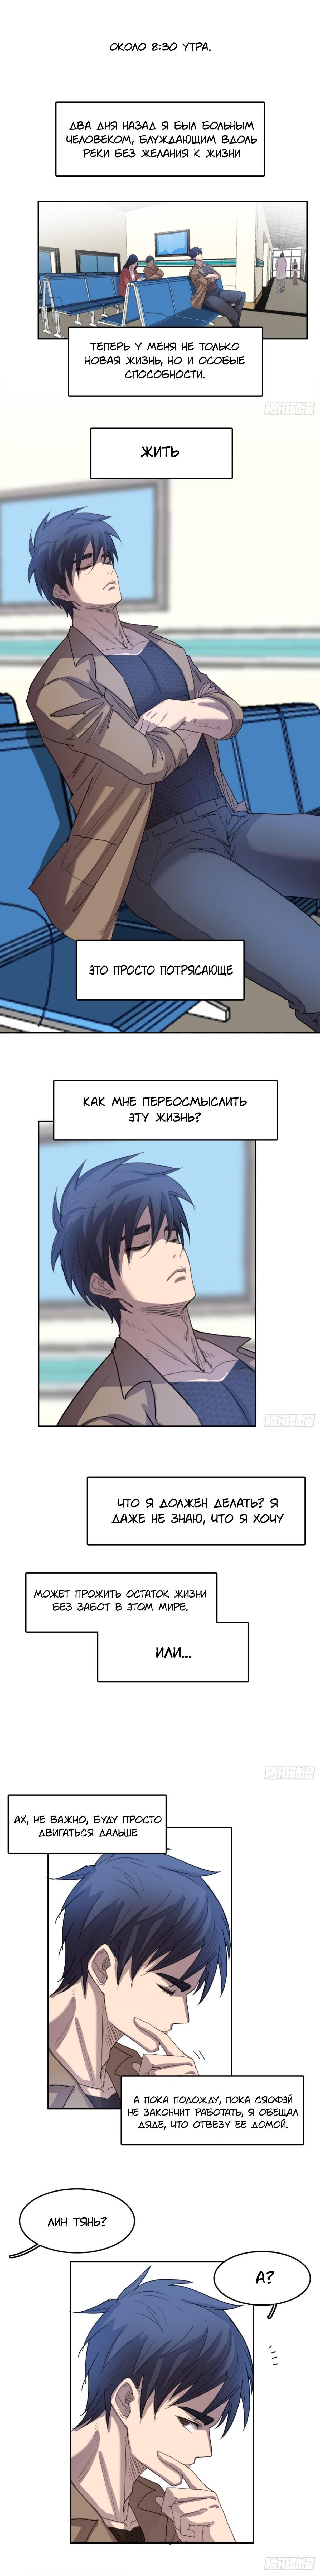 https://nimg.taadd.com/manga3/20/10022675/100176600/1385442_2020091312573.jpg Page 1